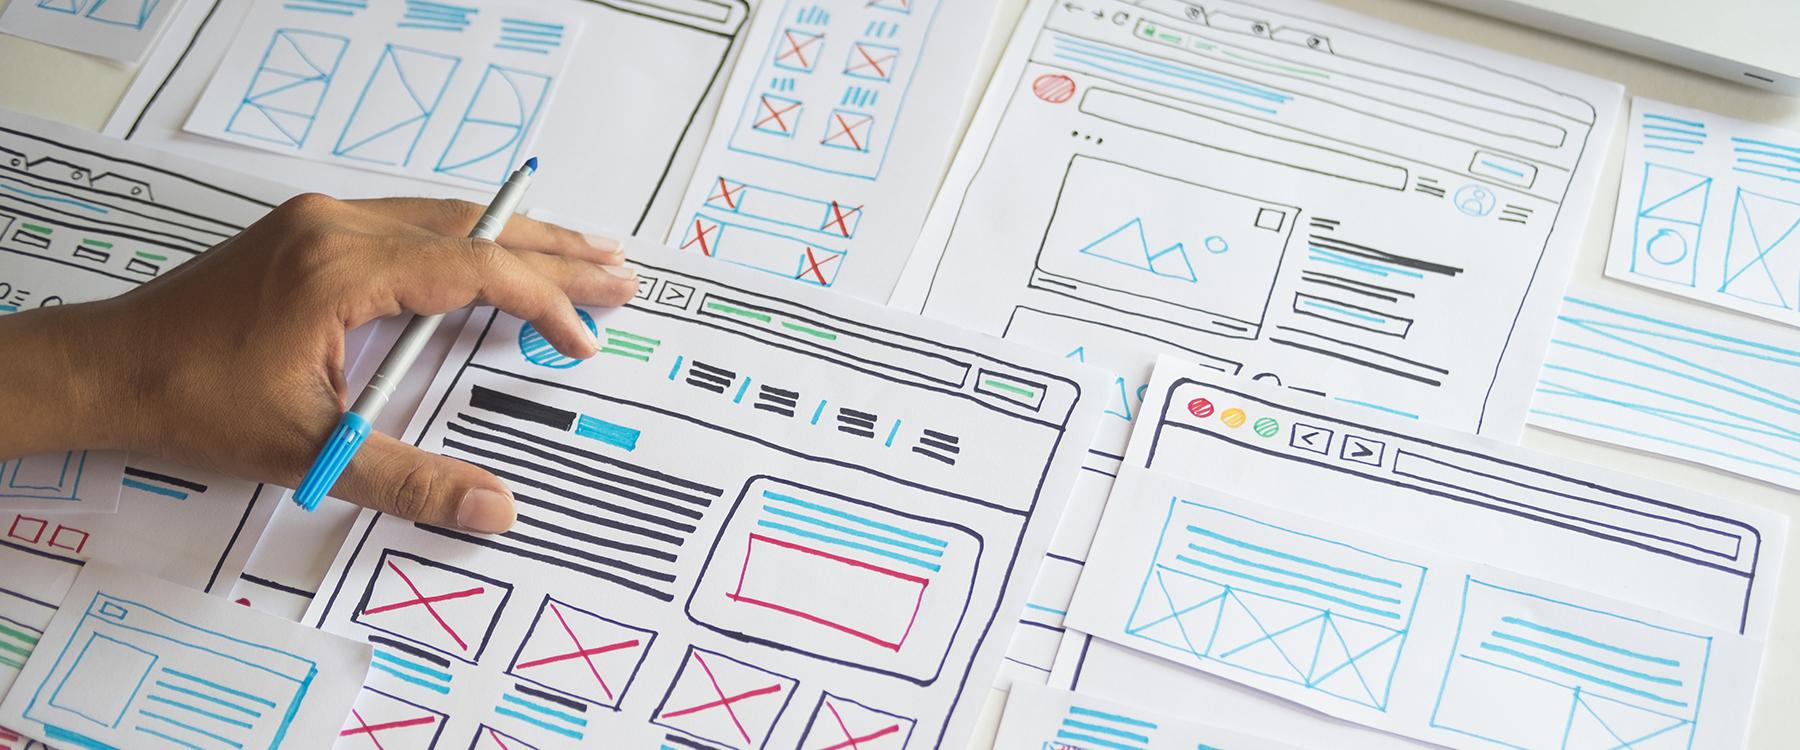 Choosing a Web Designer